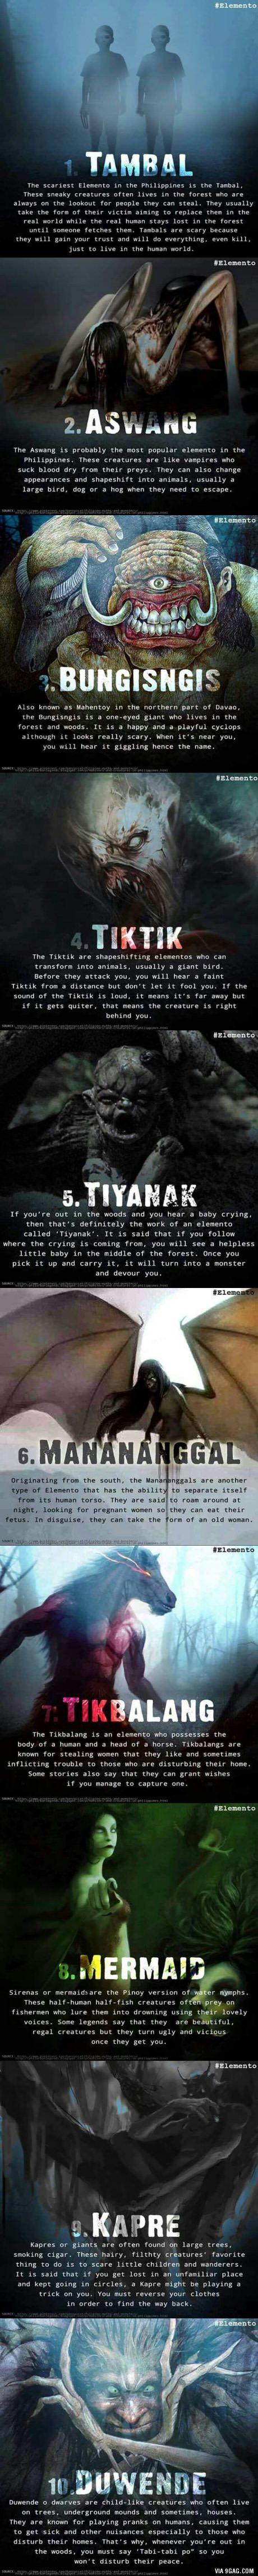 Top ten elemental spirits in the Philippines